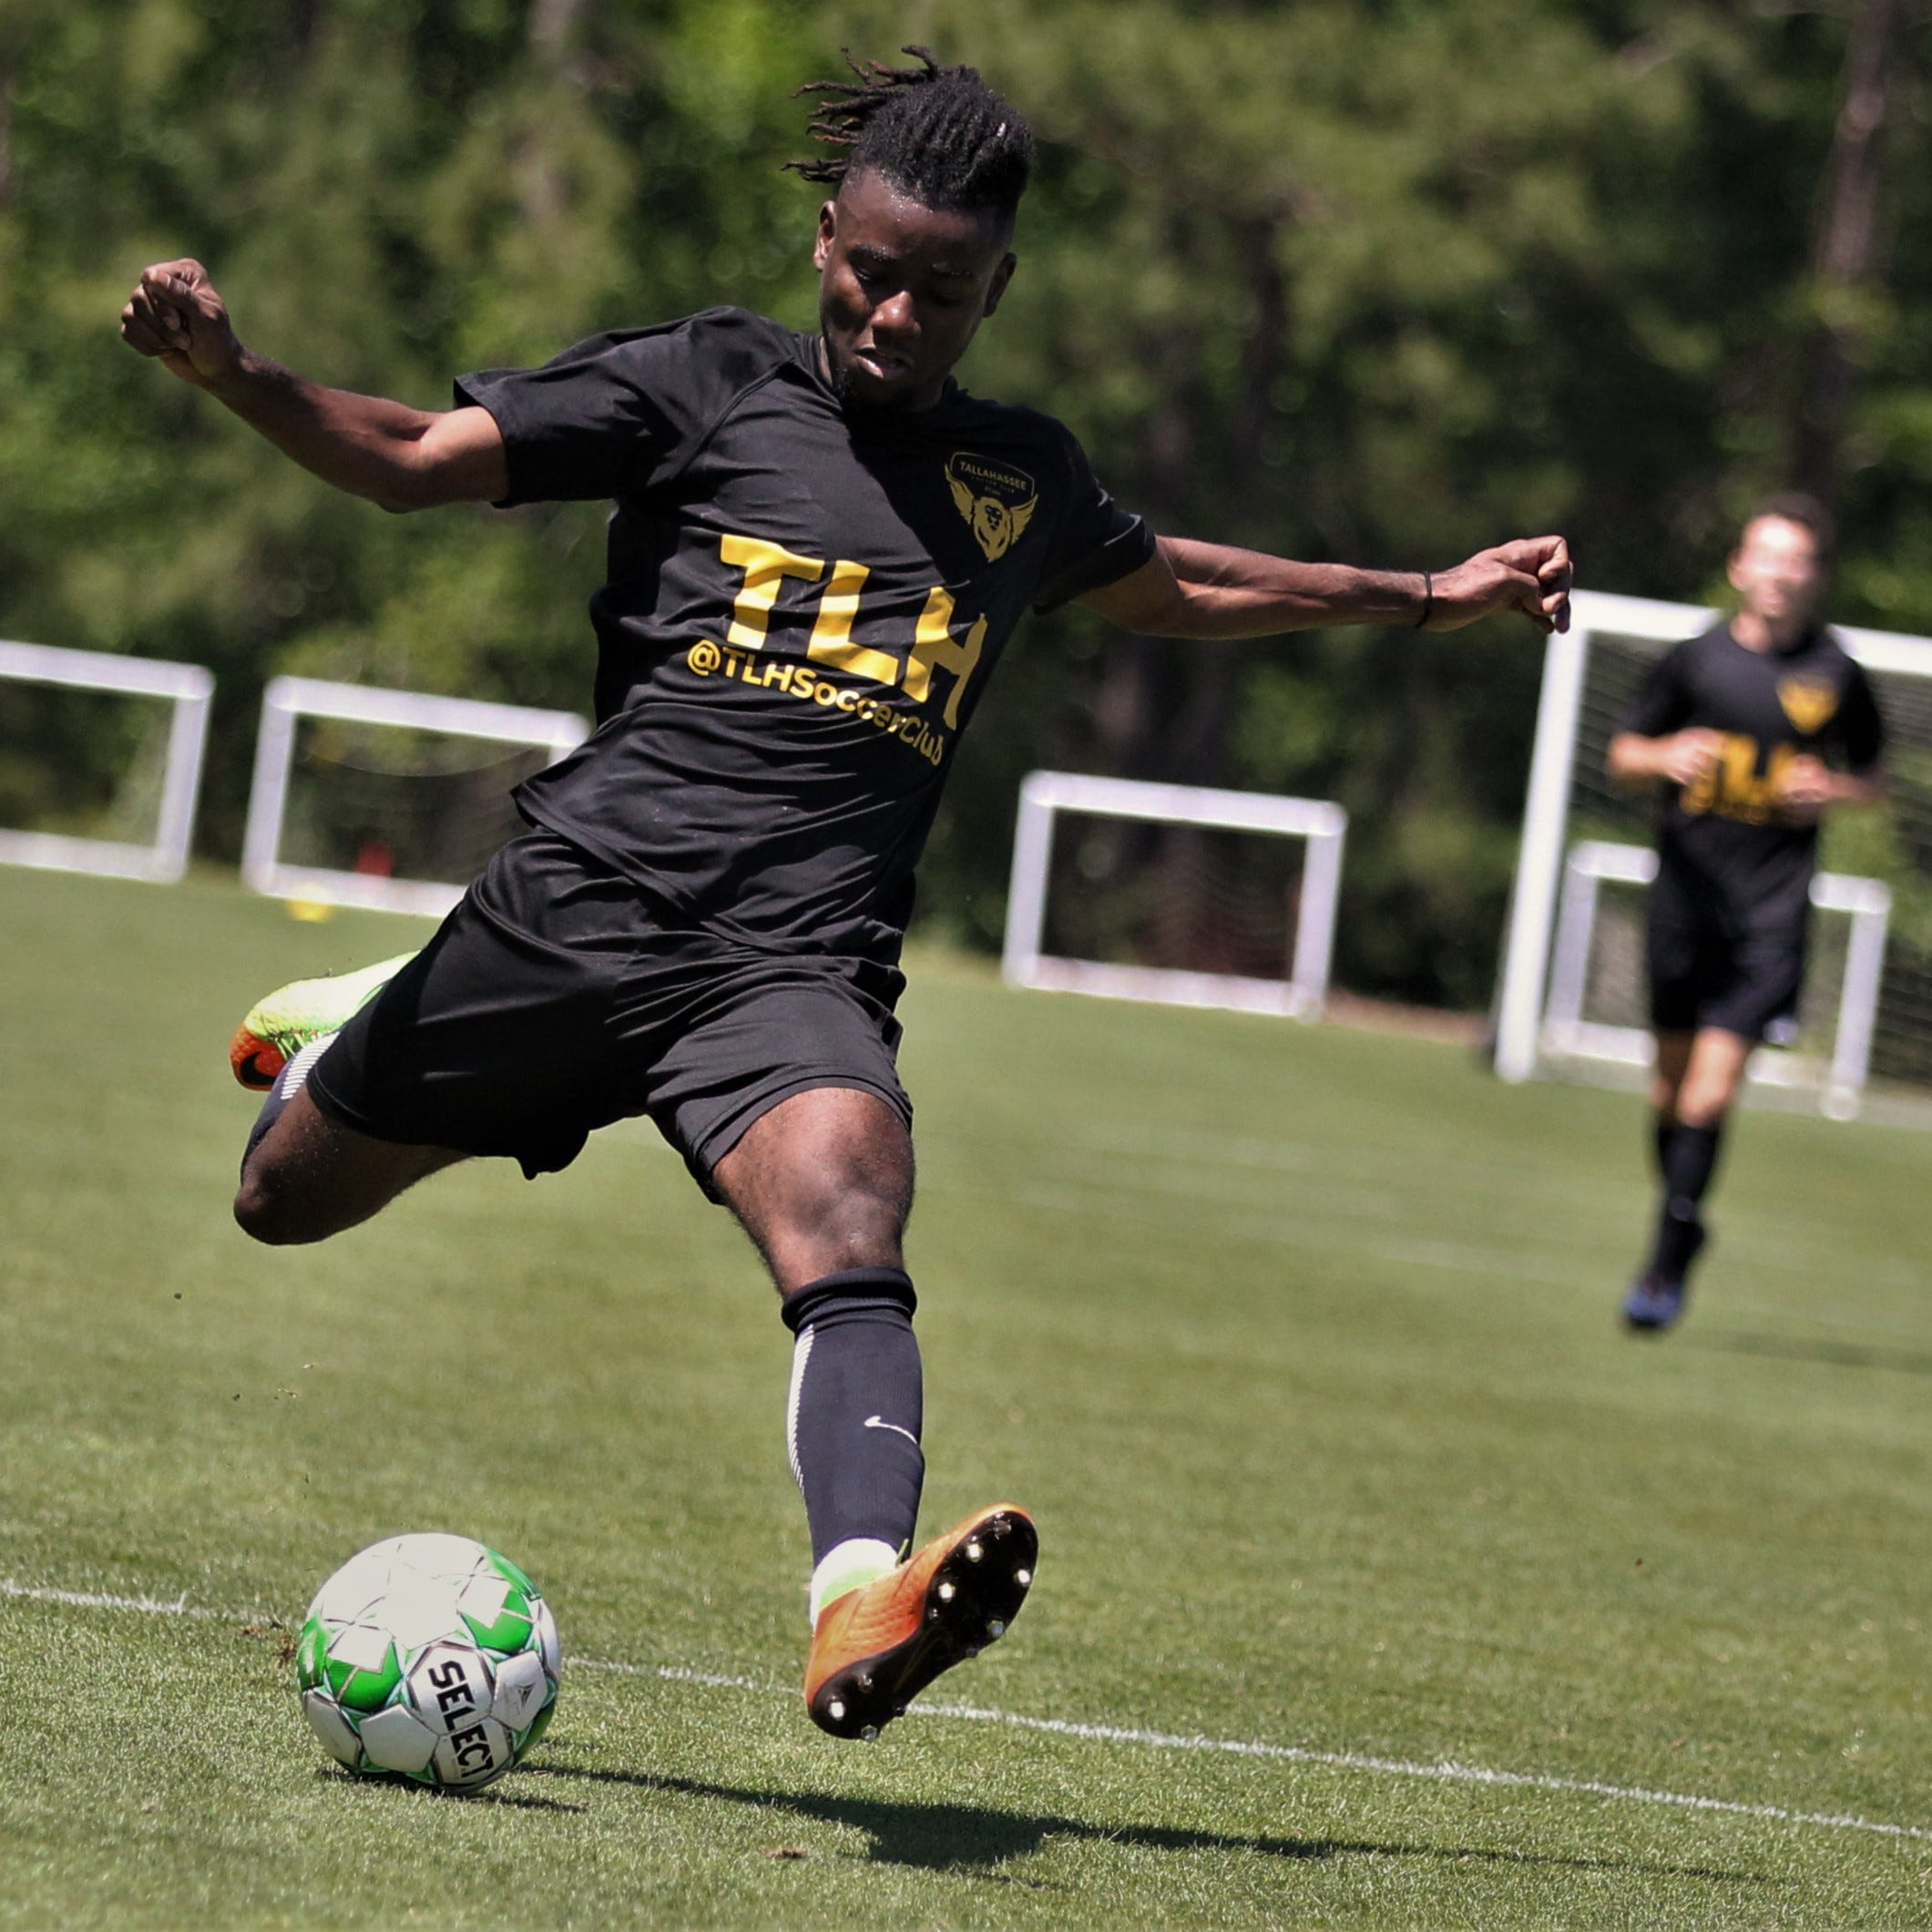 Tallahassee SC opens historic first soccer season against Savannah FC